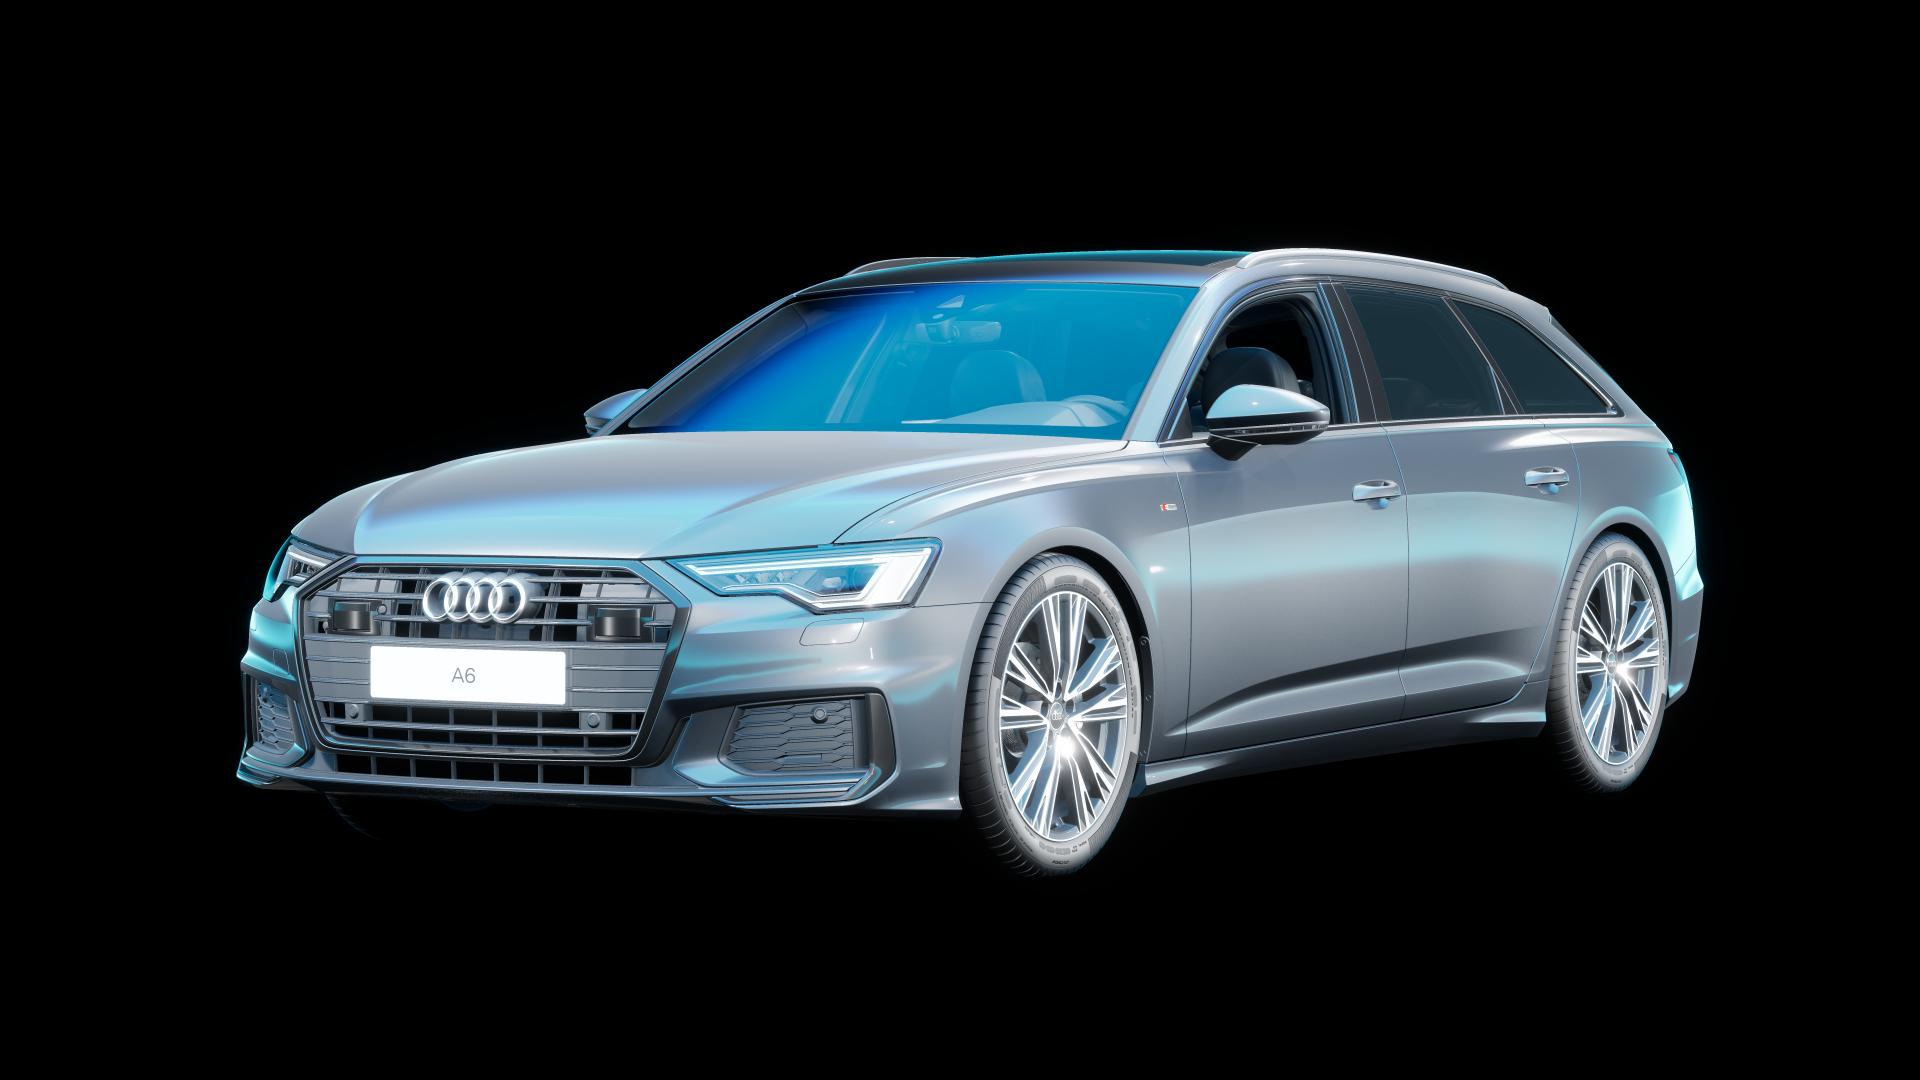 Audi A6 Avant Business Edition Sport 35 TDI  120(163) kW(pk) S tronic